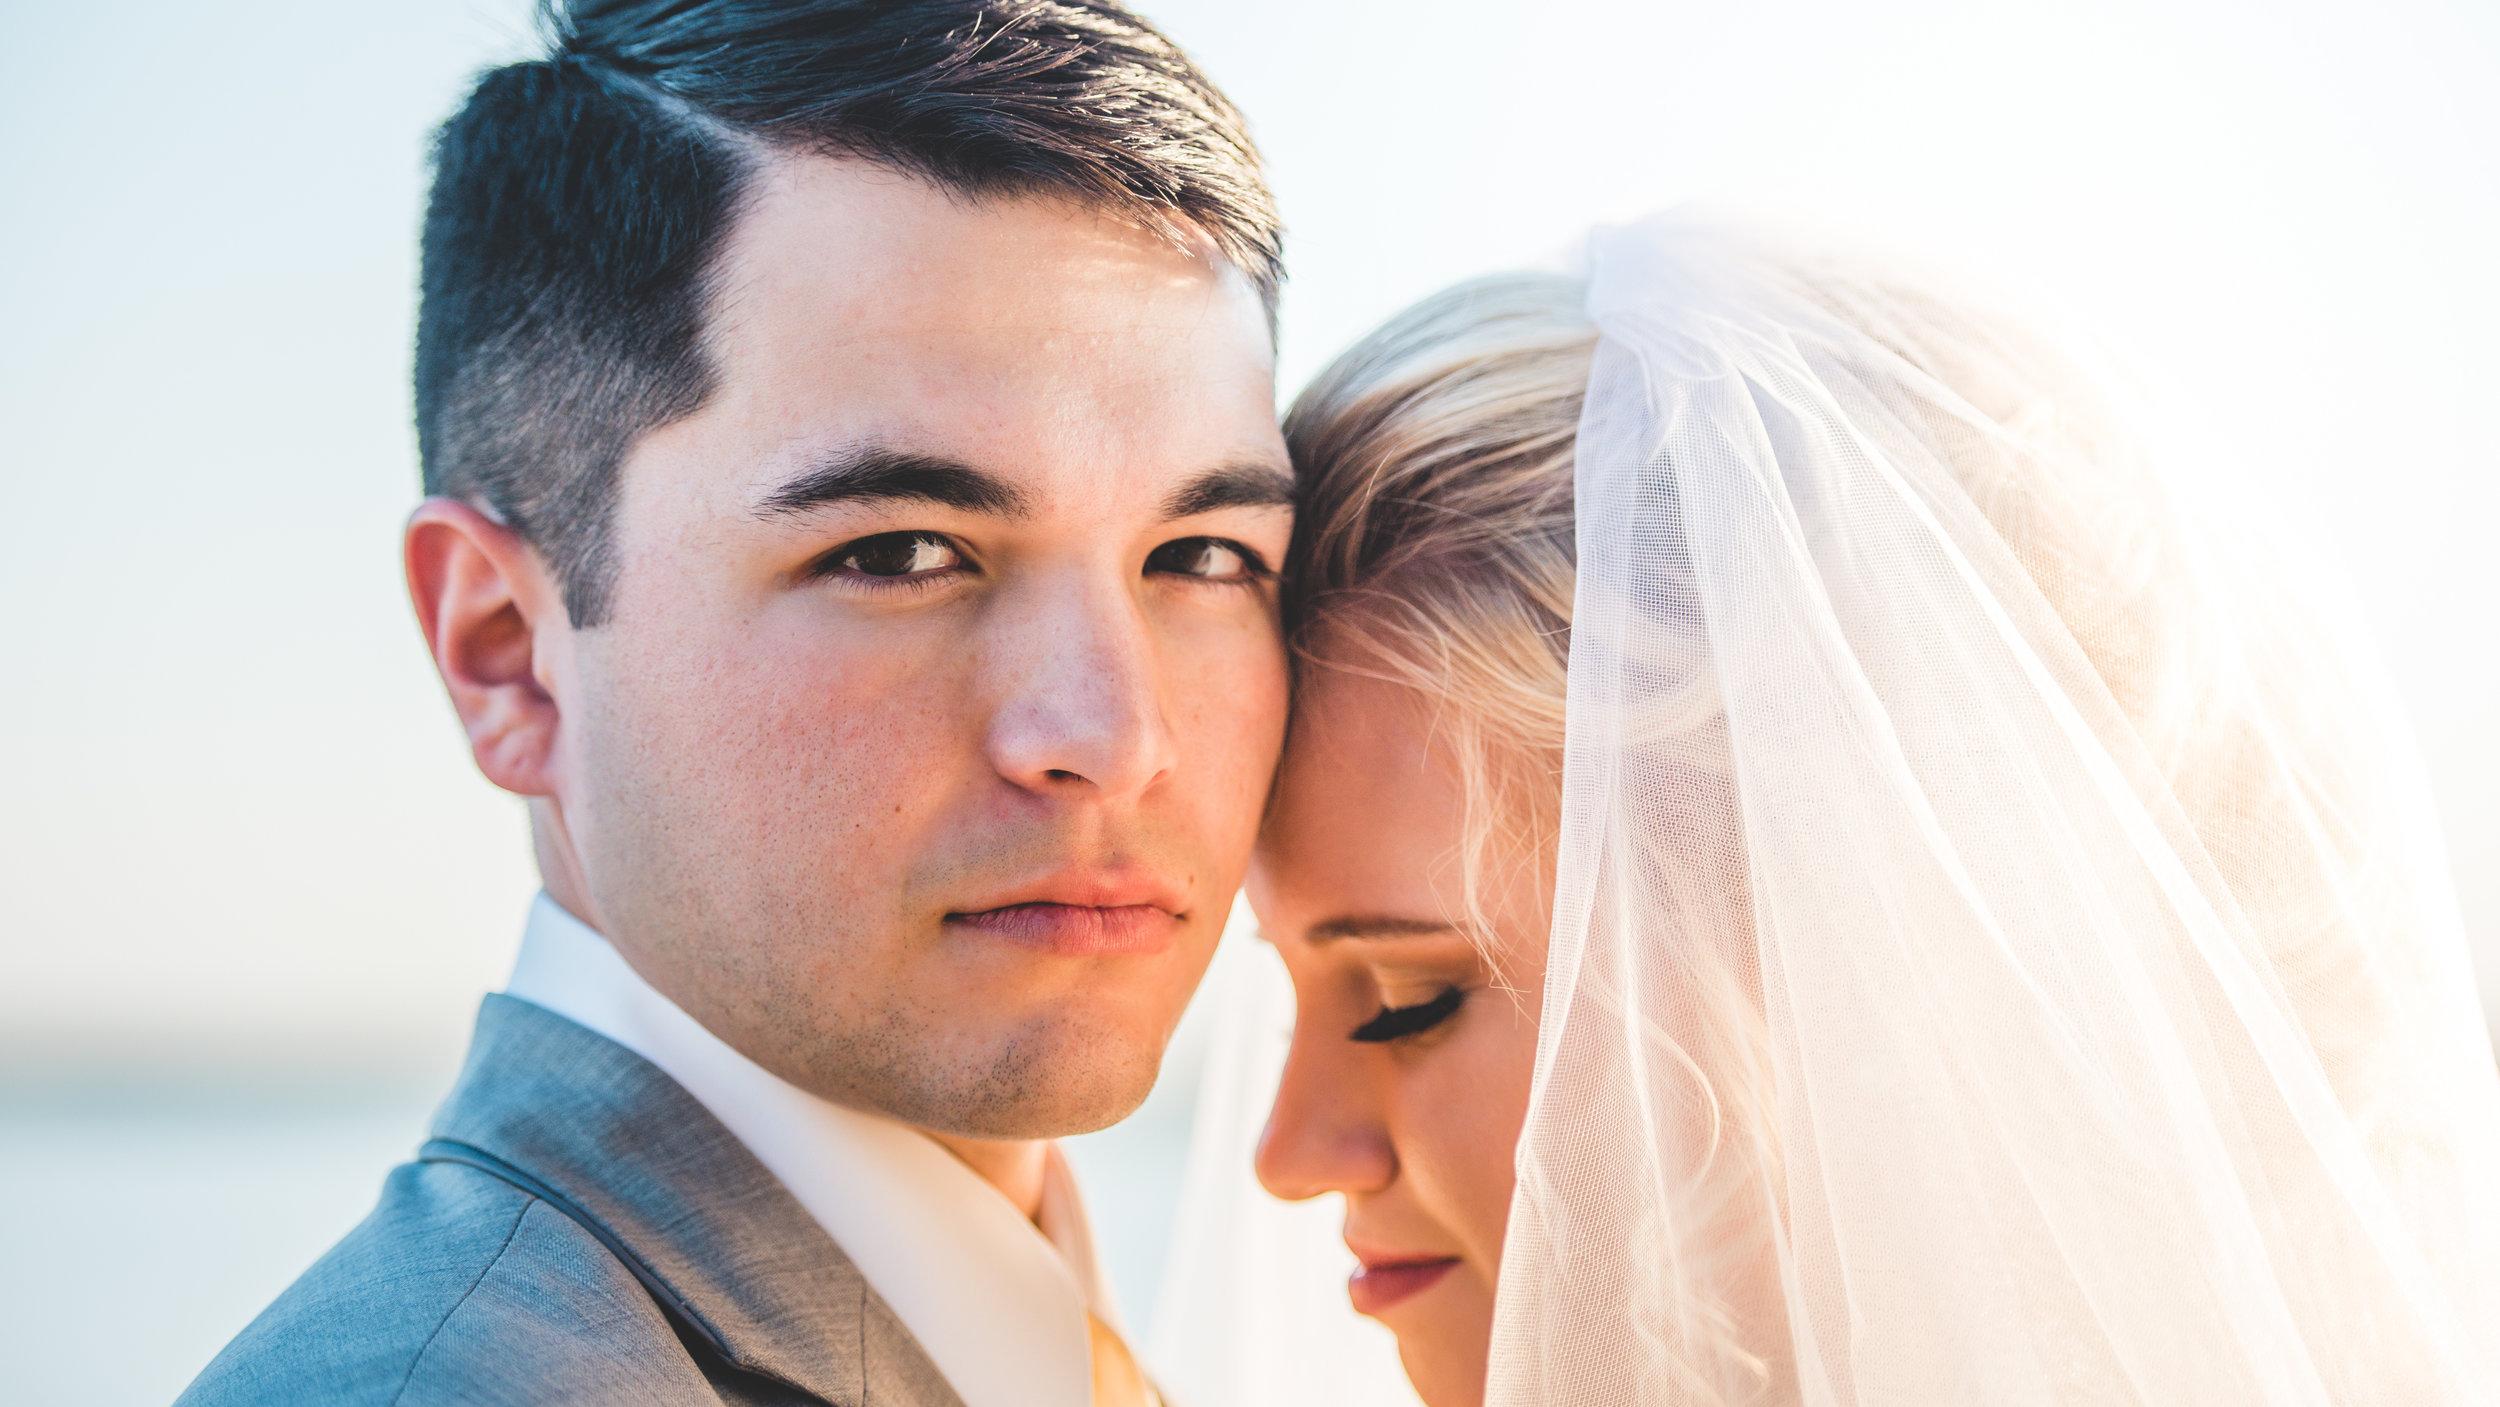 CCW - Creative Cure Weddings - Peyton and Alex - Southern Illinois Wedding Photography-4.jpg